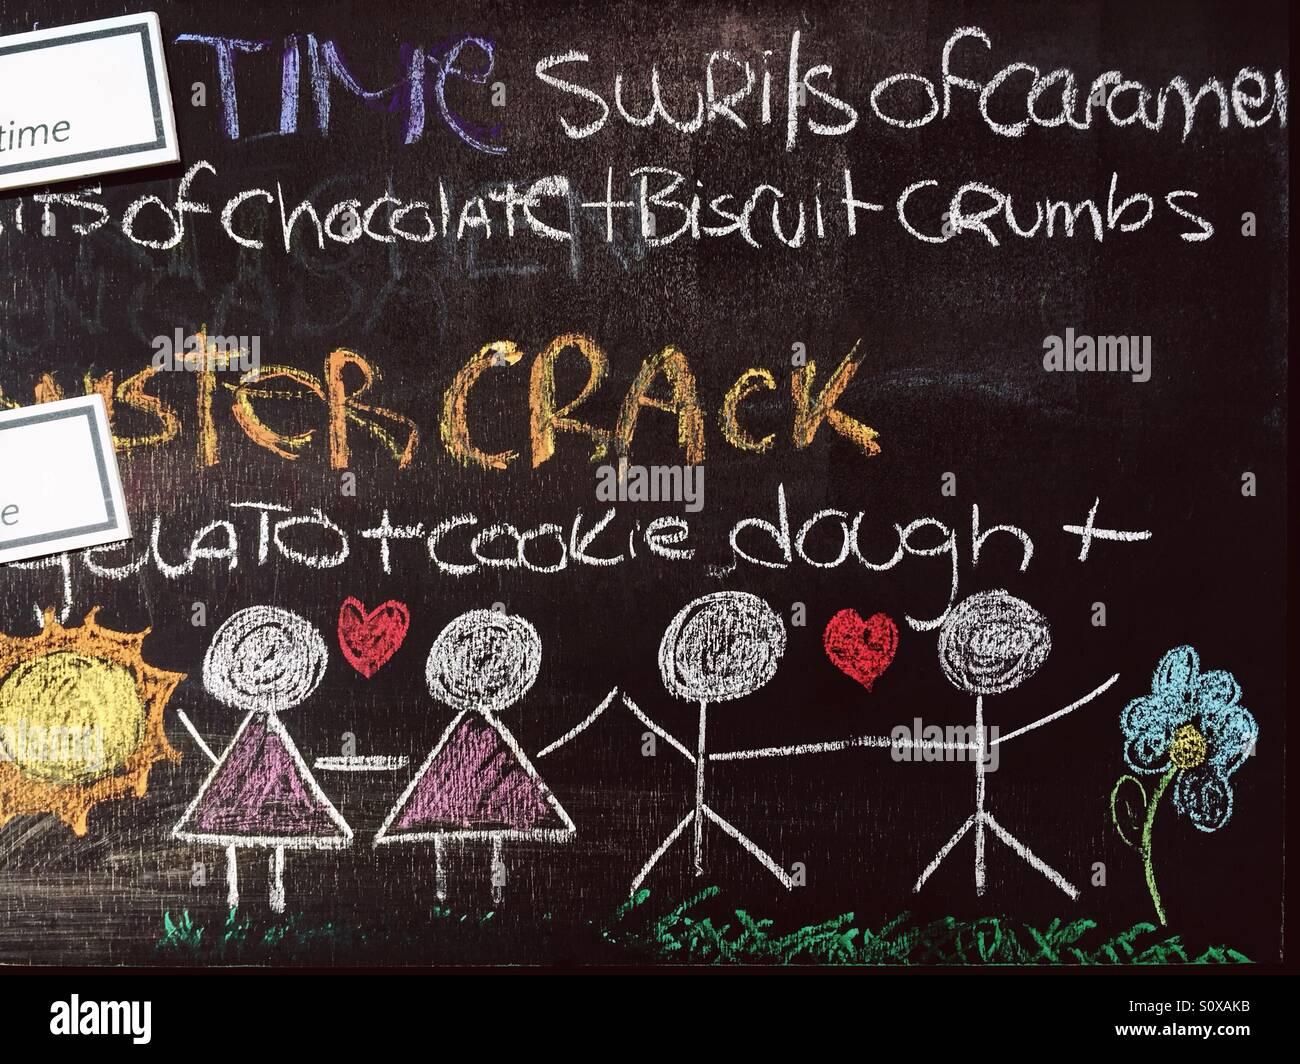 Colorful writings on the blackboard - Stock Image